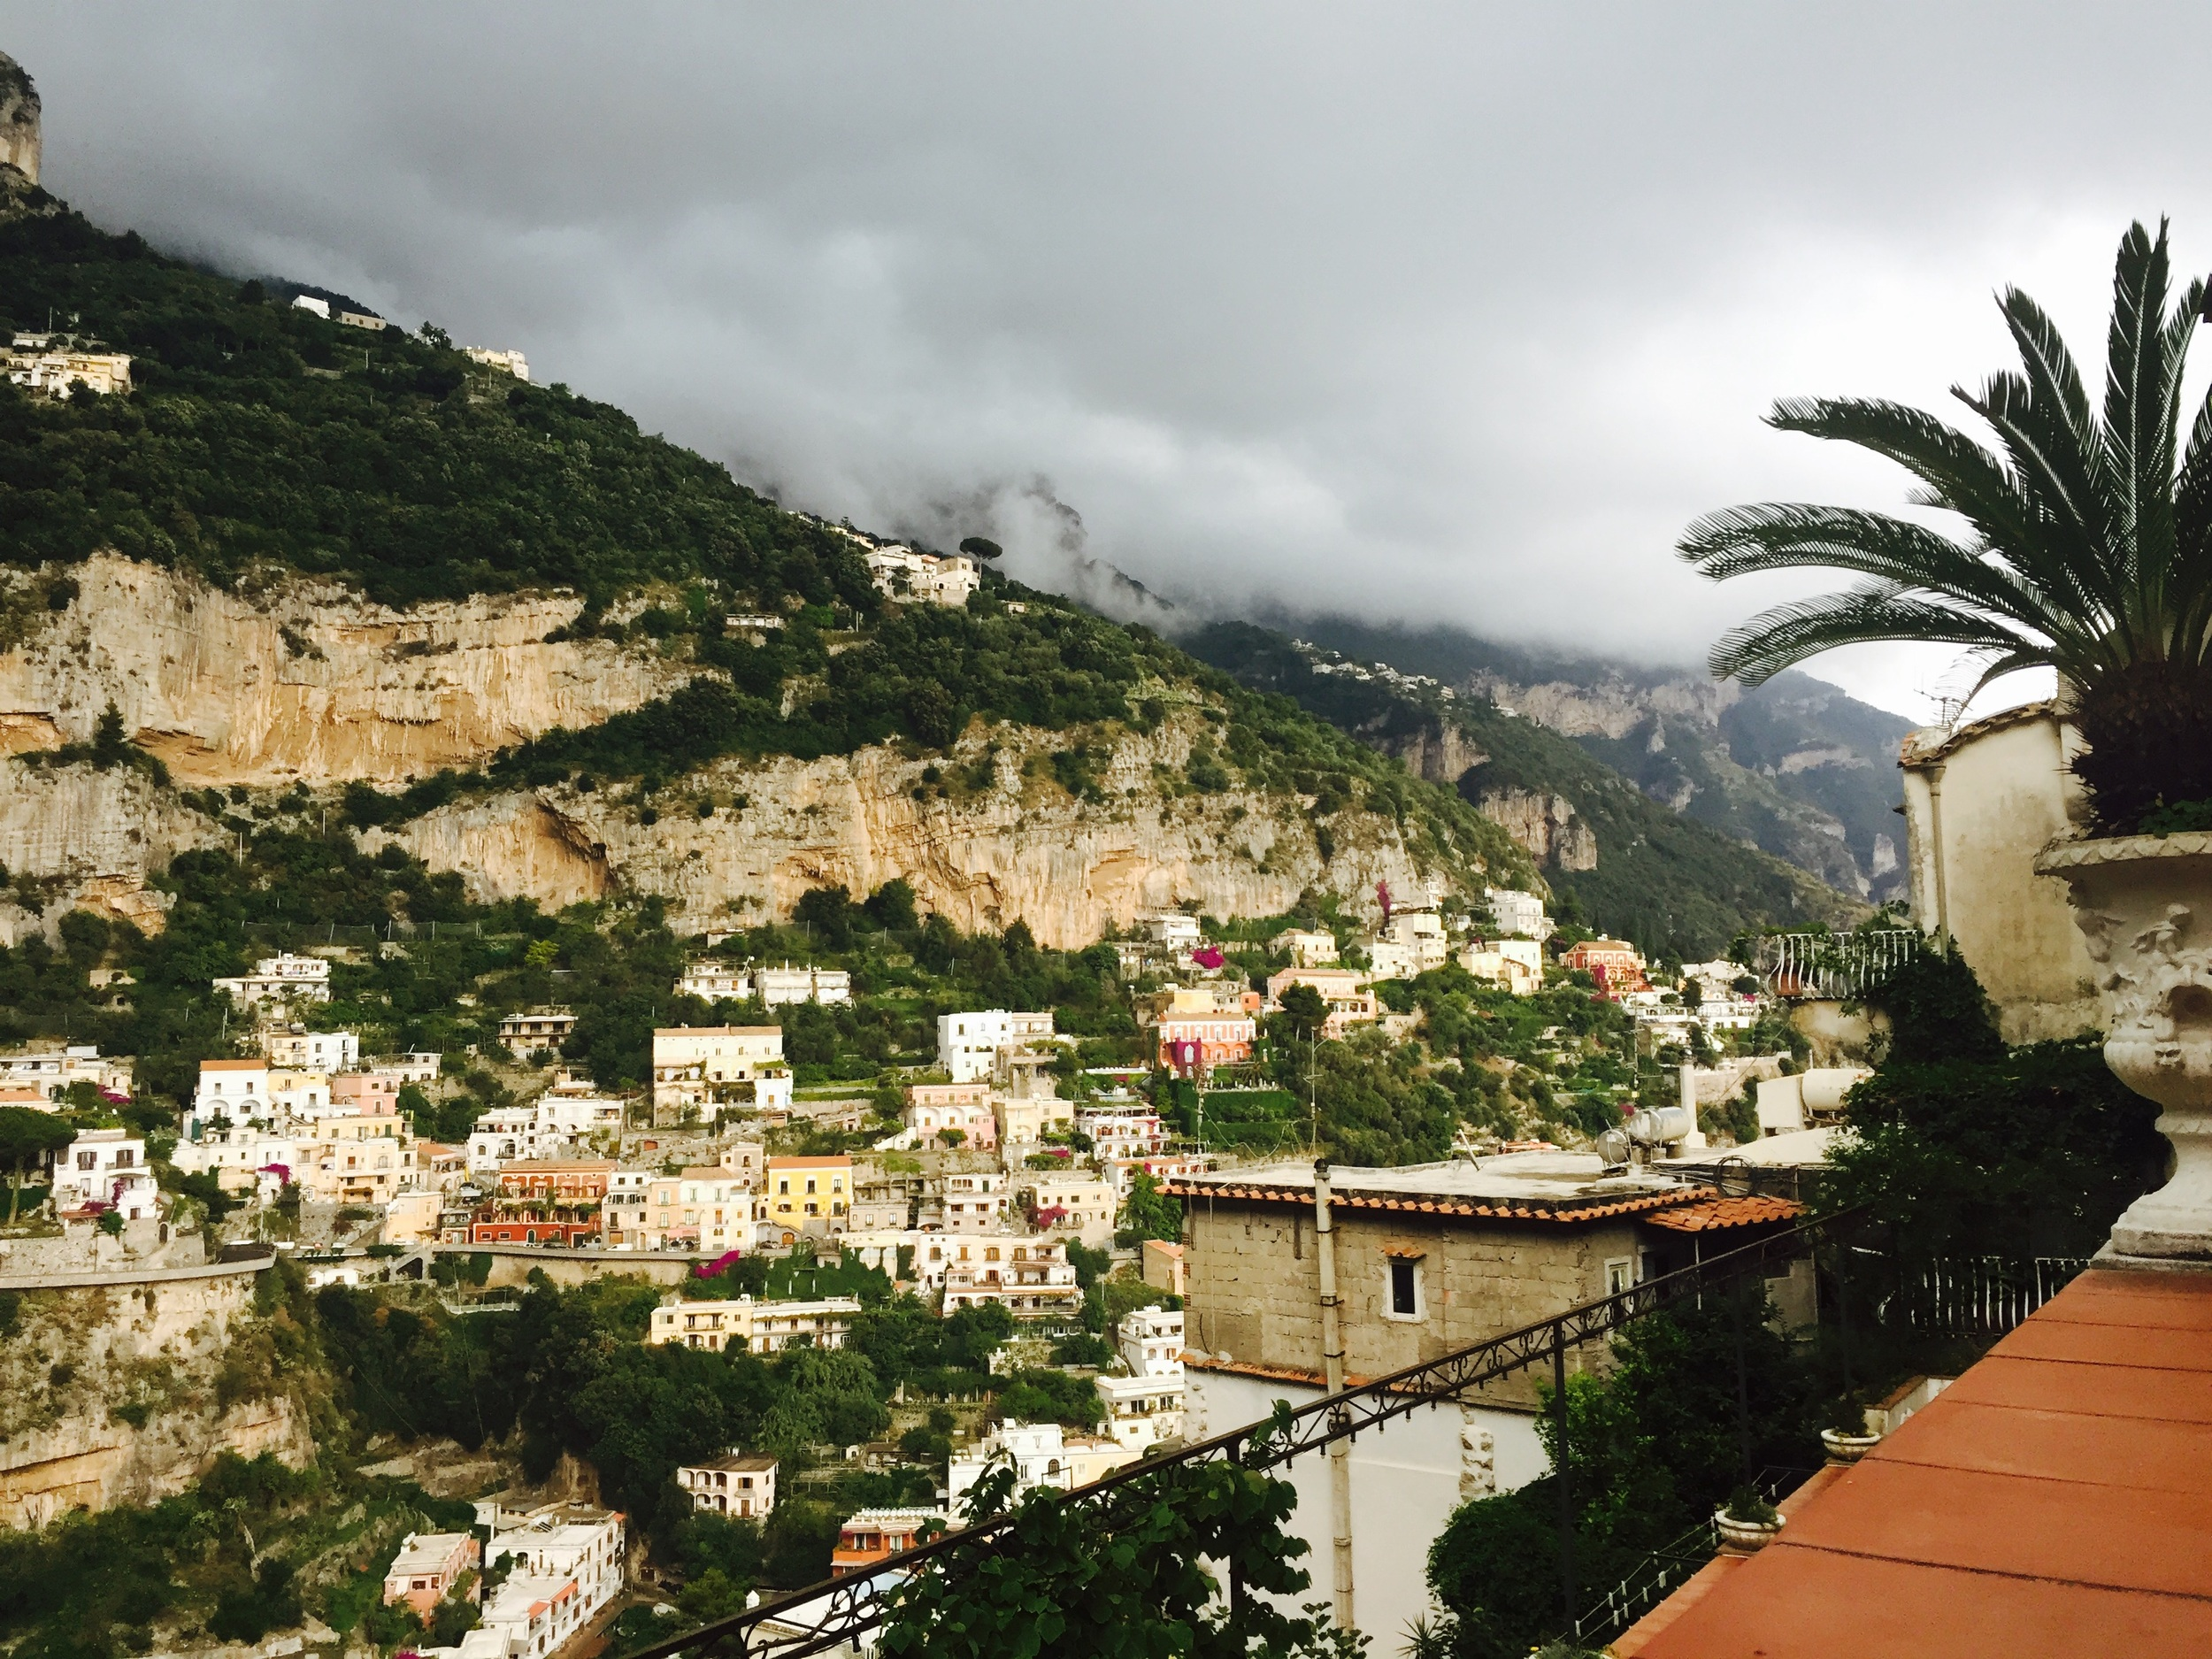 View from Villa Palumbo